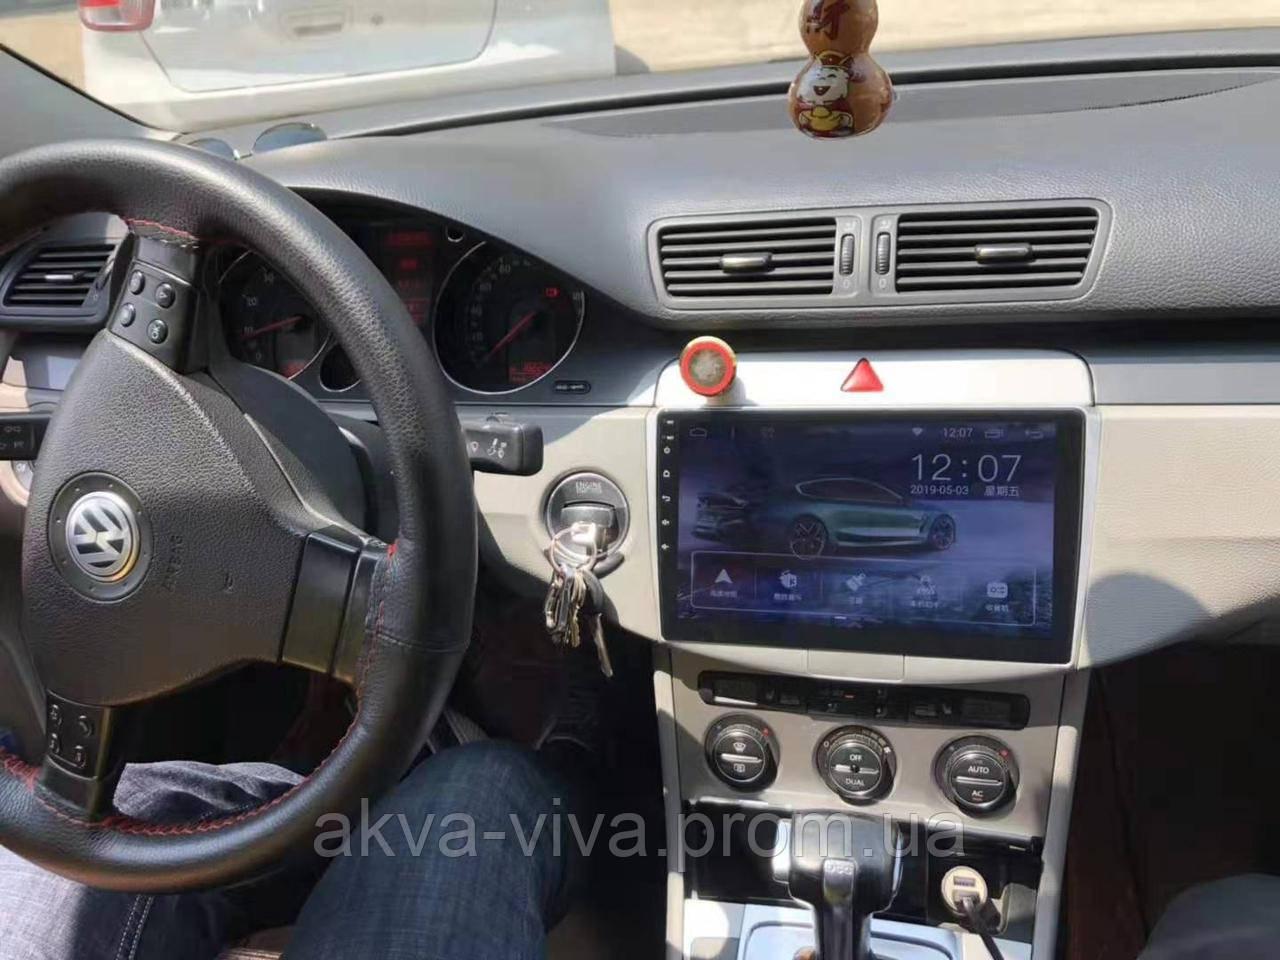 Штатная автомагнитола для Volkswagen Passat B6 2006-2011 на ANDROID 8.1 (М-ФПБ6-10)